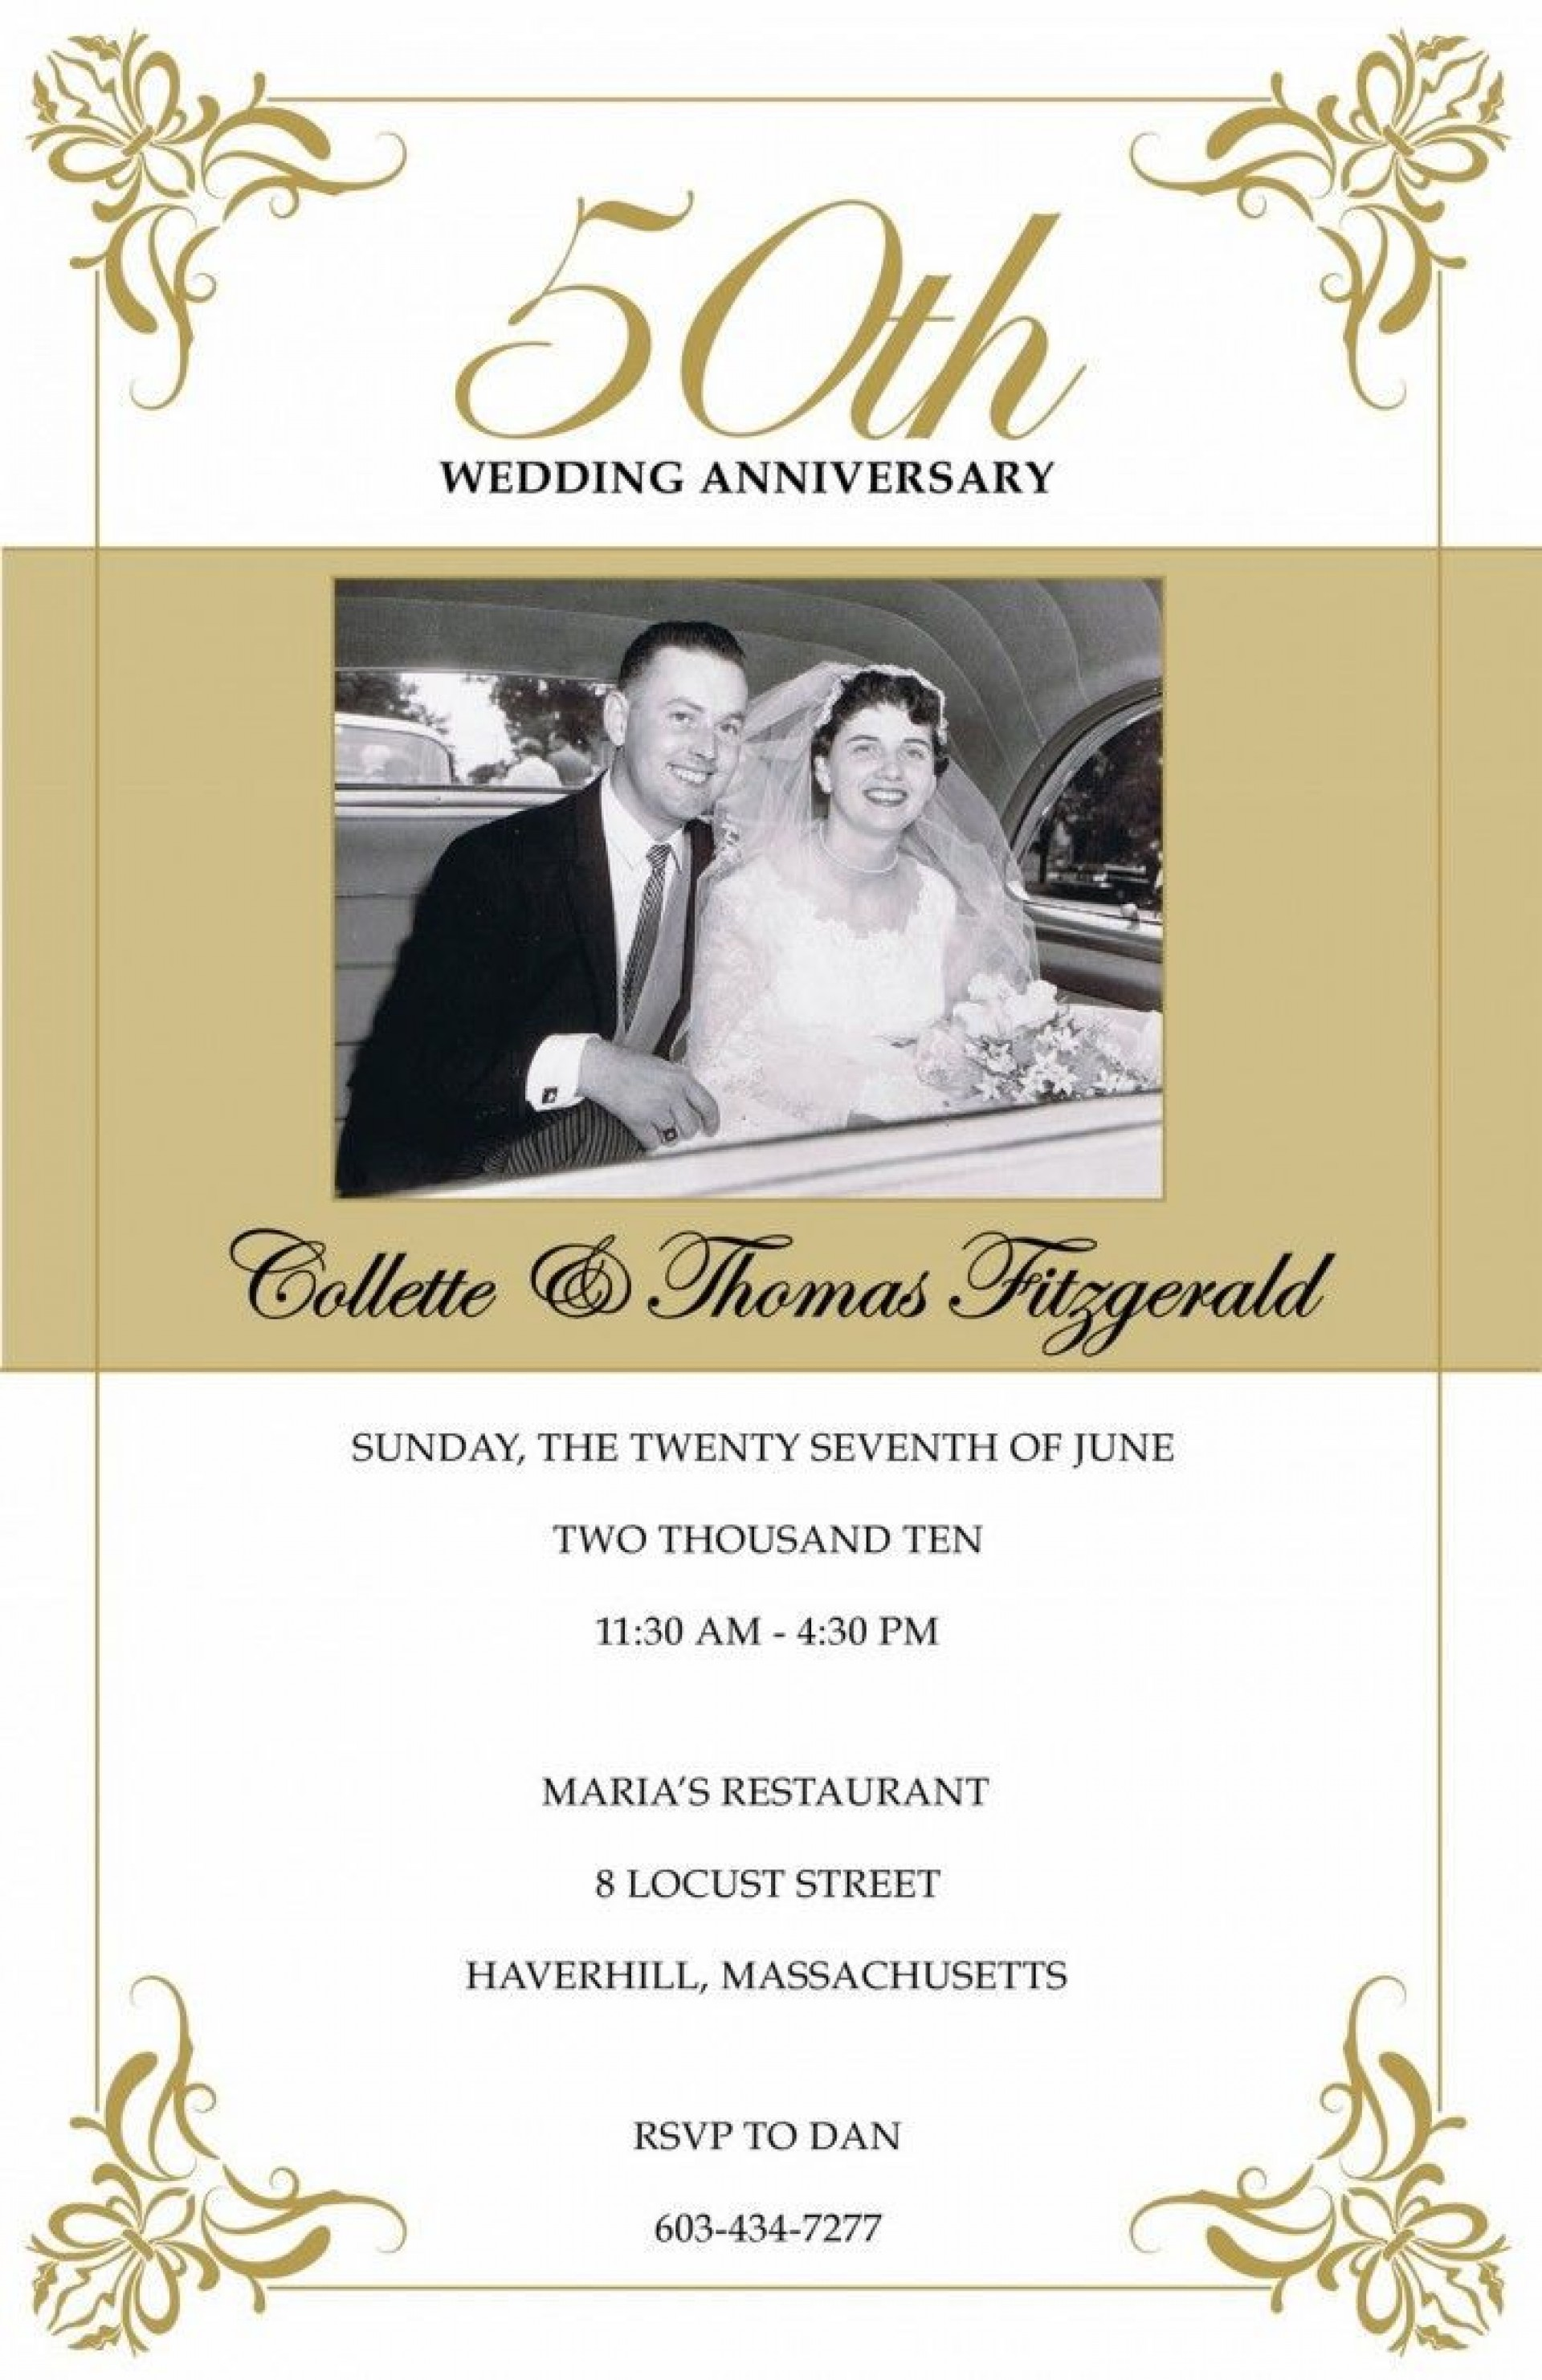 008 Shocking 50th Wedding Anniversary Invitation Design Image  Designs Wording Sample Card Template Free Download1920